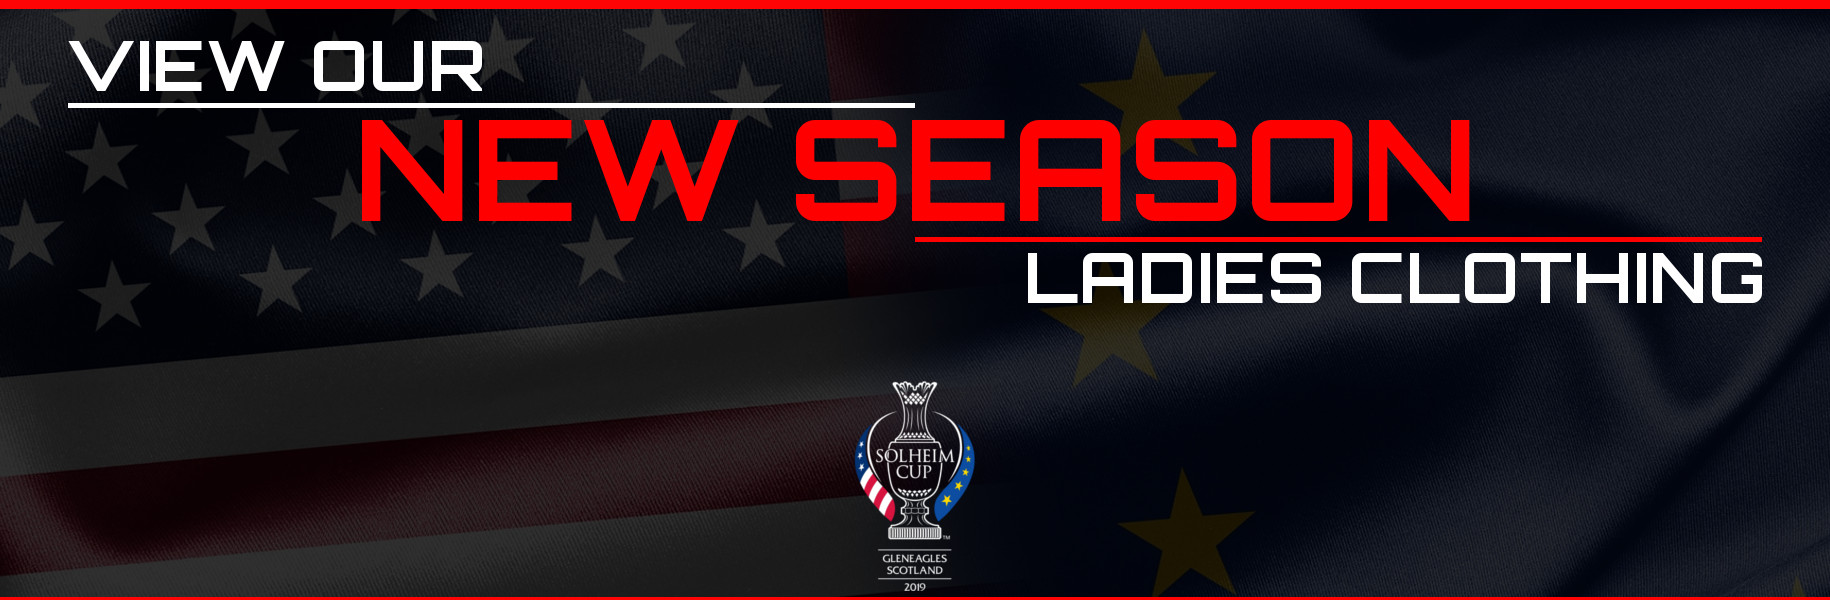 Solheim Cup 2019 New Season Ladies clothing